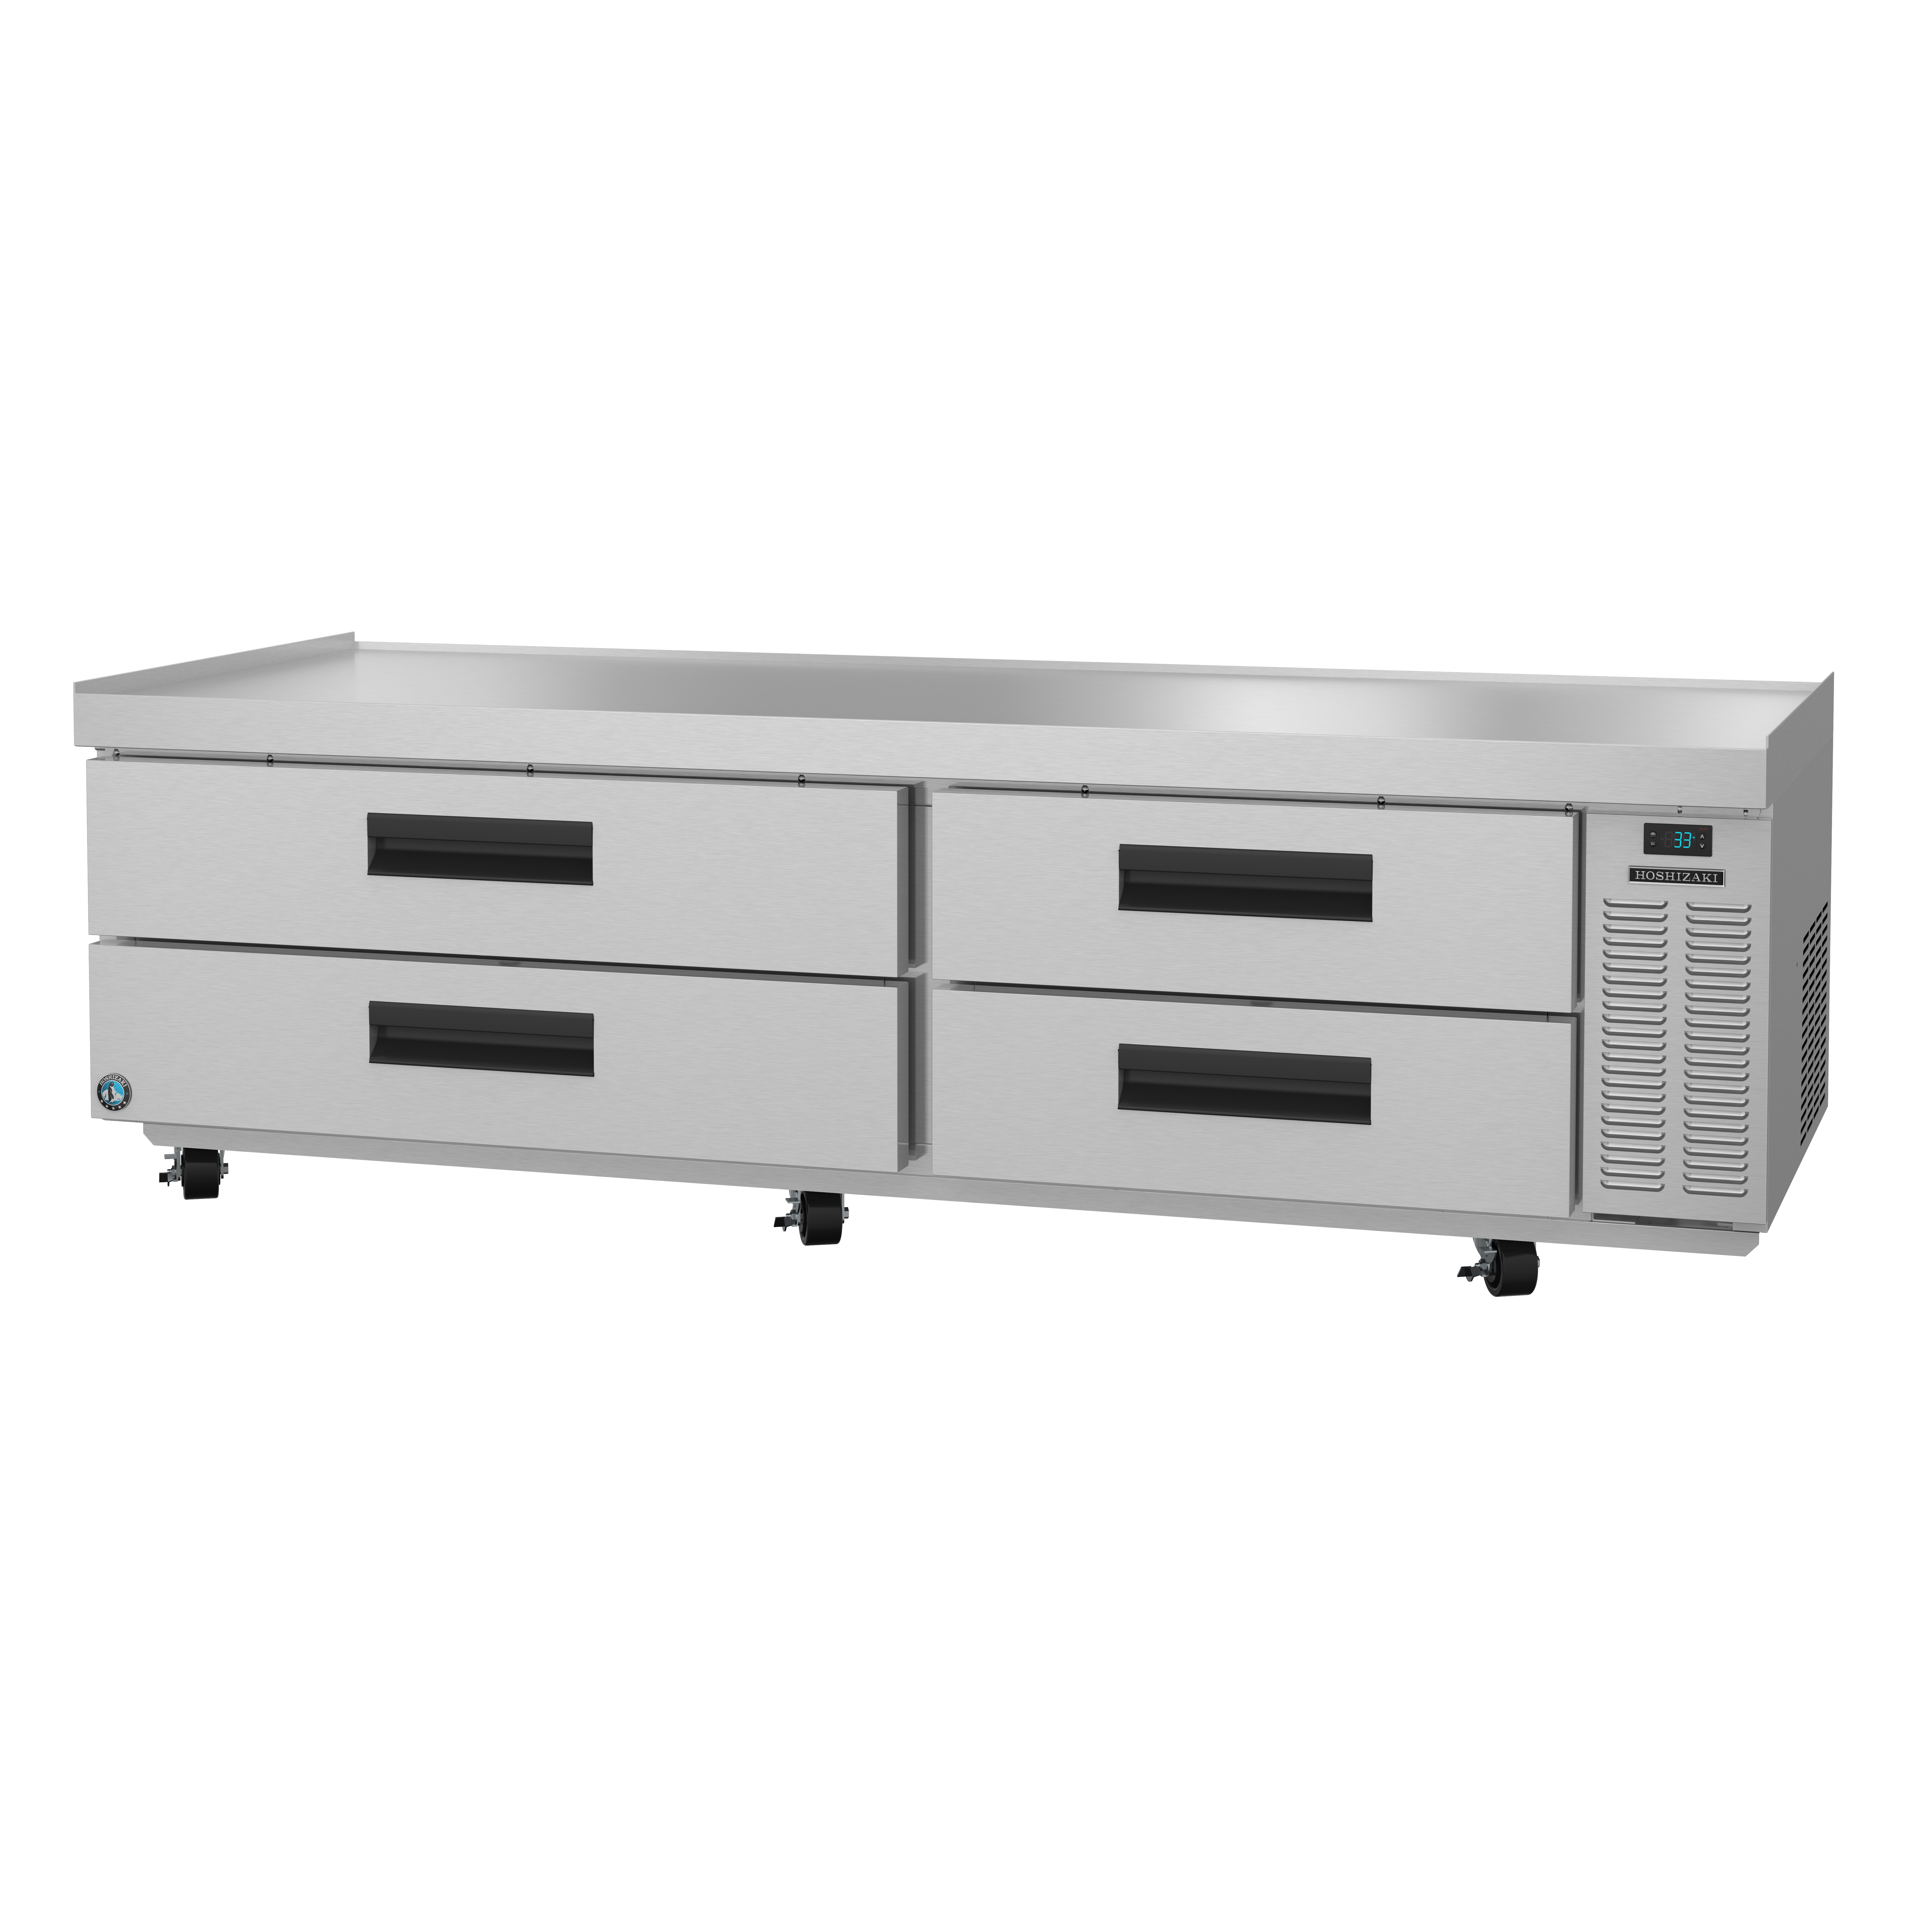 Hoshizaki CR85A equipment stand, refrigerated base